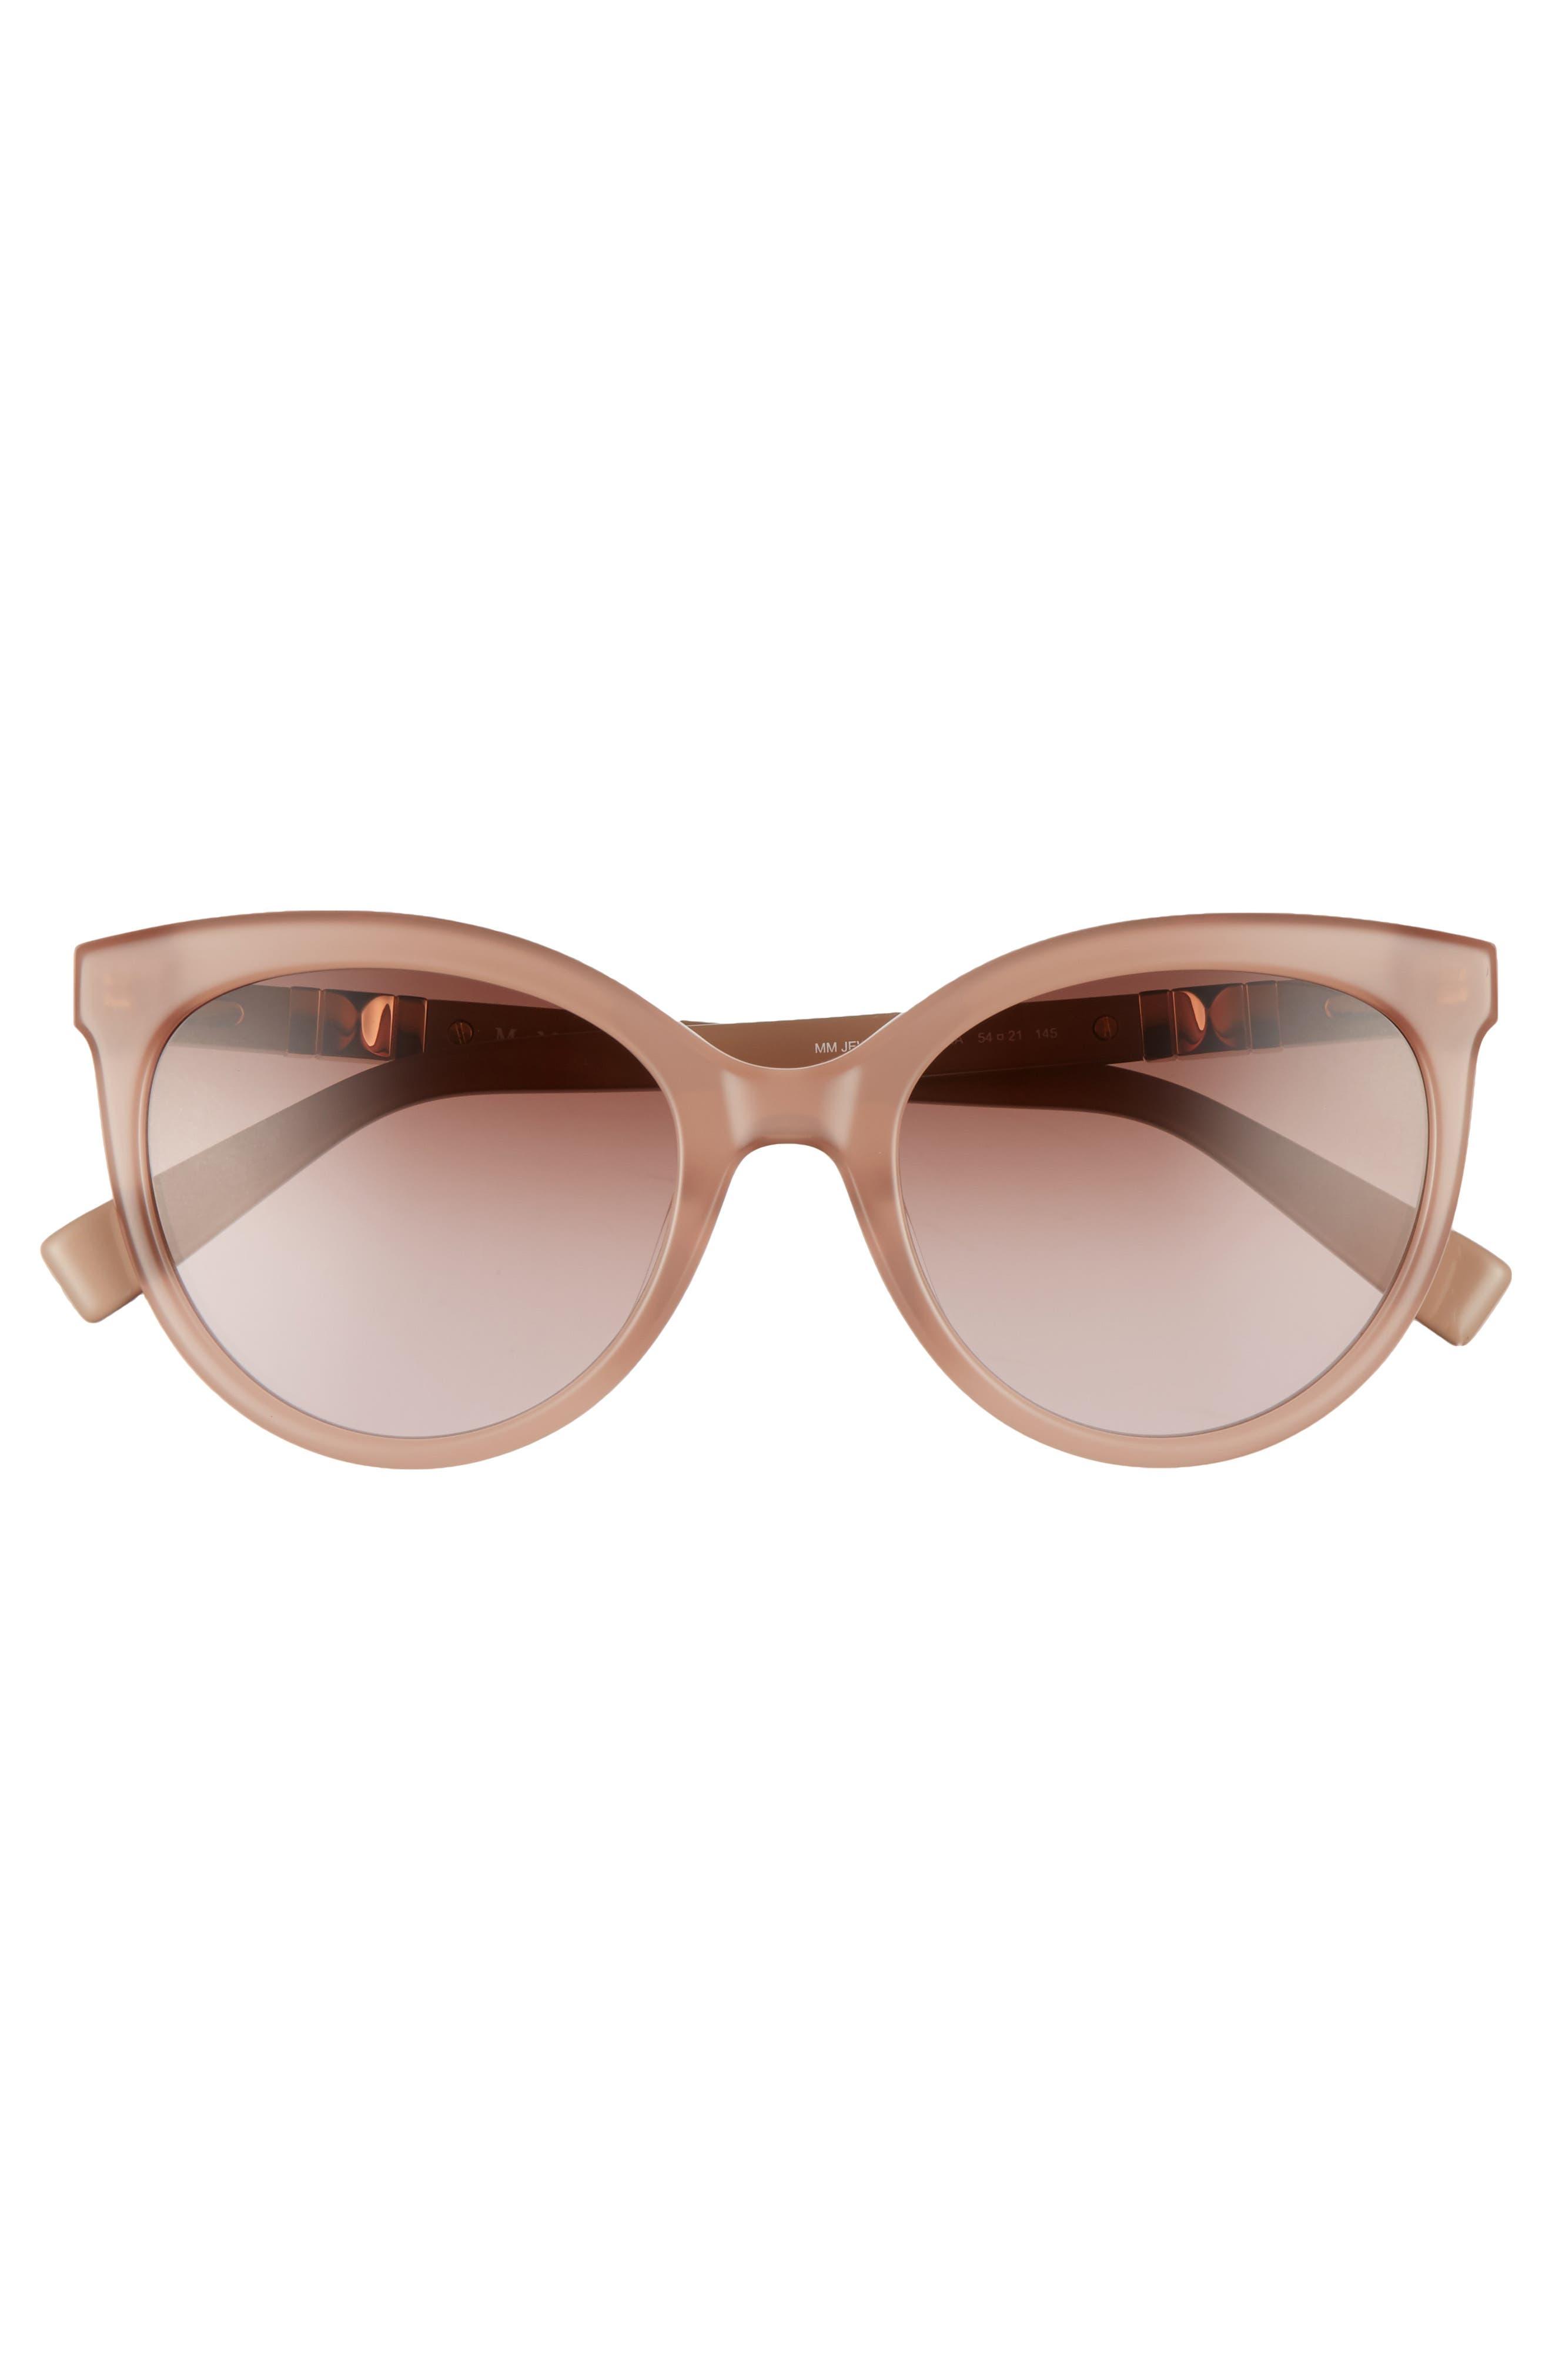 Jeweliis 54mm Gradient Cat Eye Sunglasses,                             Alternate thumbnail 3, color,                             Nude